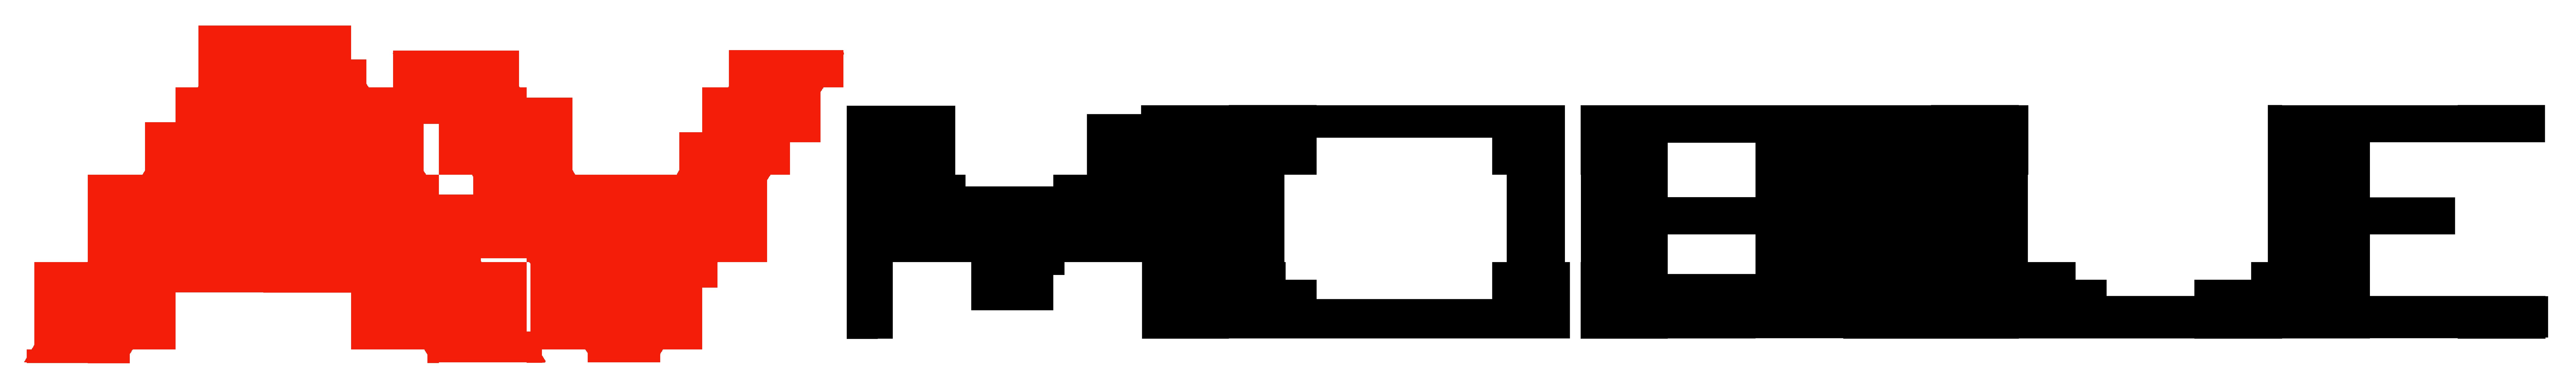 Mobile Logo Png.